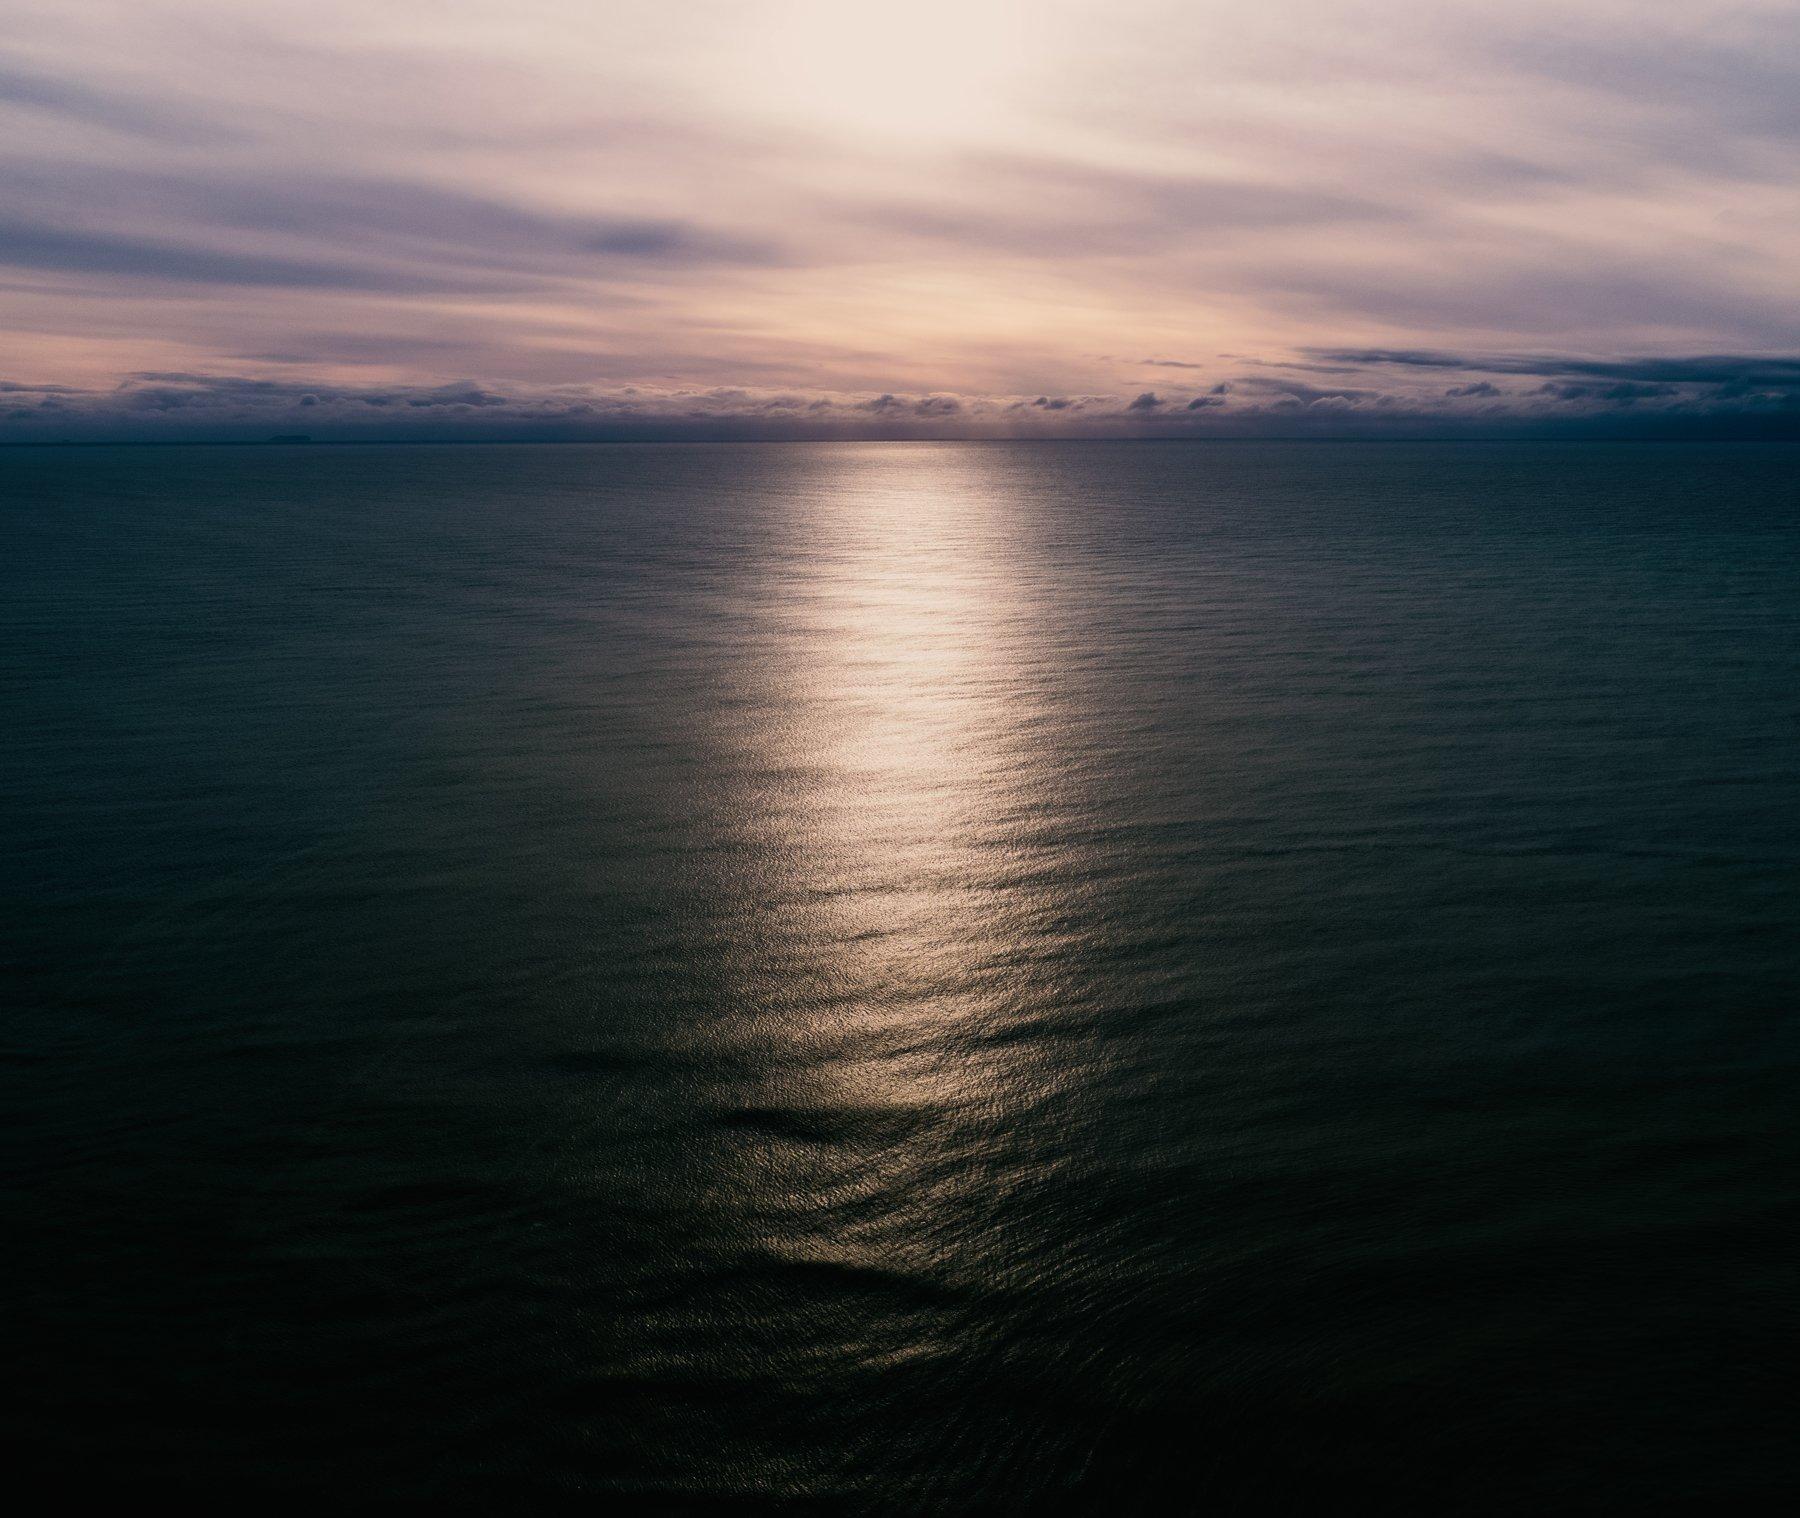 аэрофотосъёмка,пейзаж,iceland,абстракция, Stepanov Ruslan